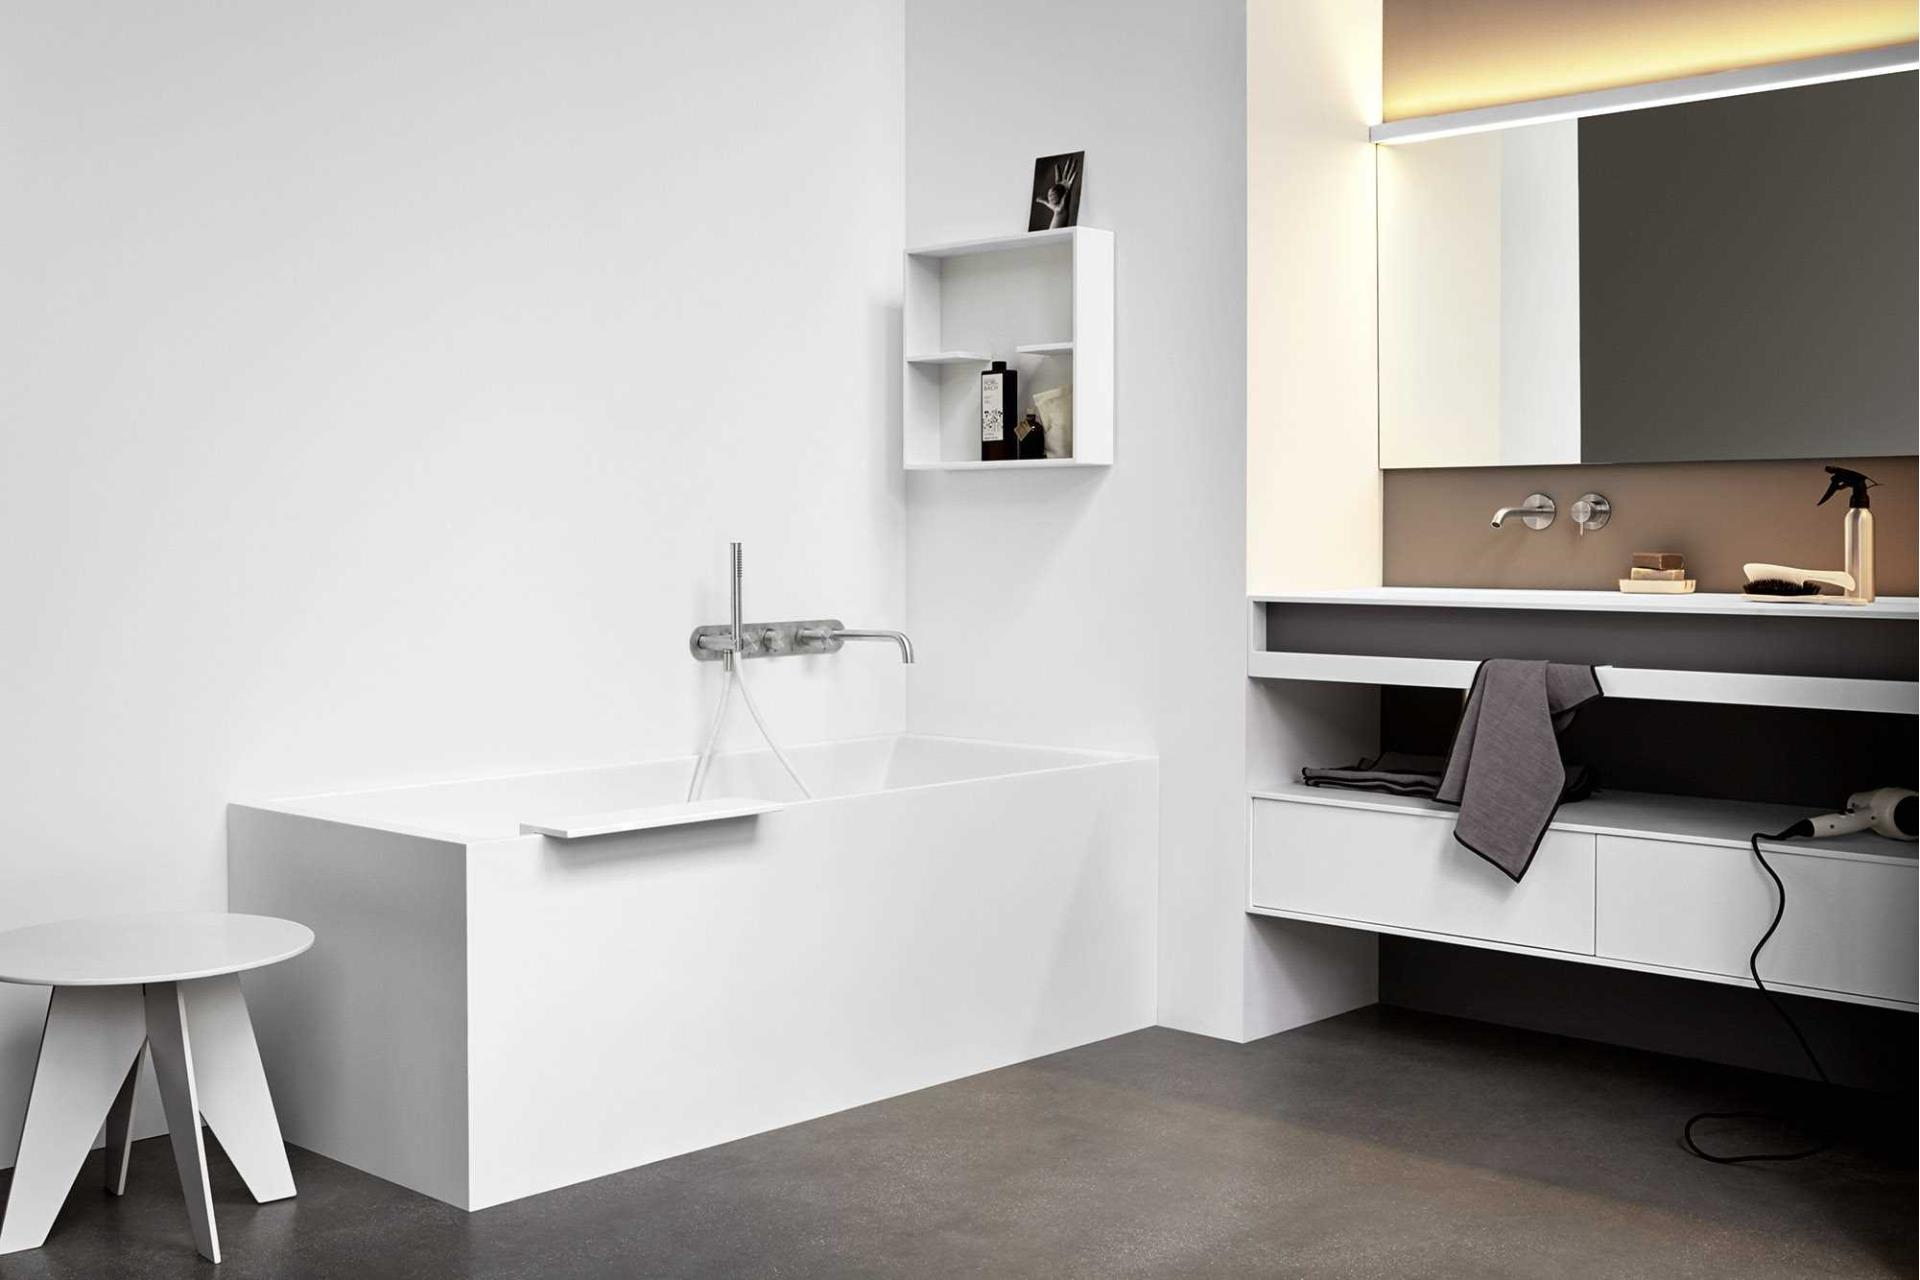 Vasca Doccia Rexa Design.Sanitari Arredo Bagno Alto Adige Unico Mobili Da Bagno E Lavabi